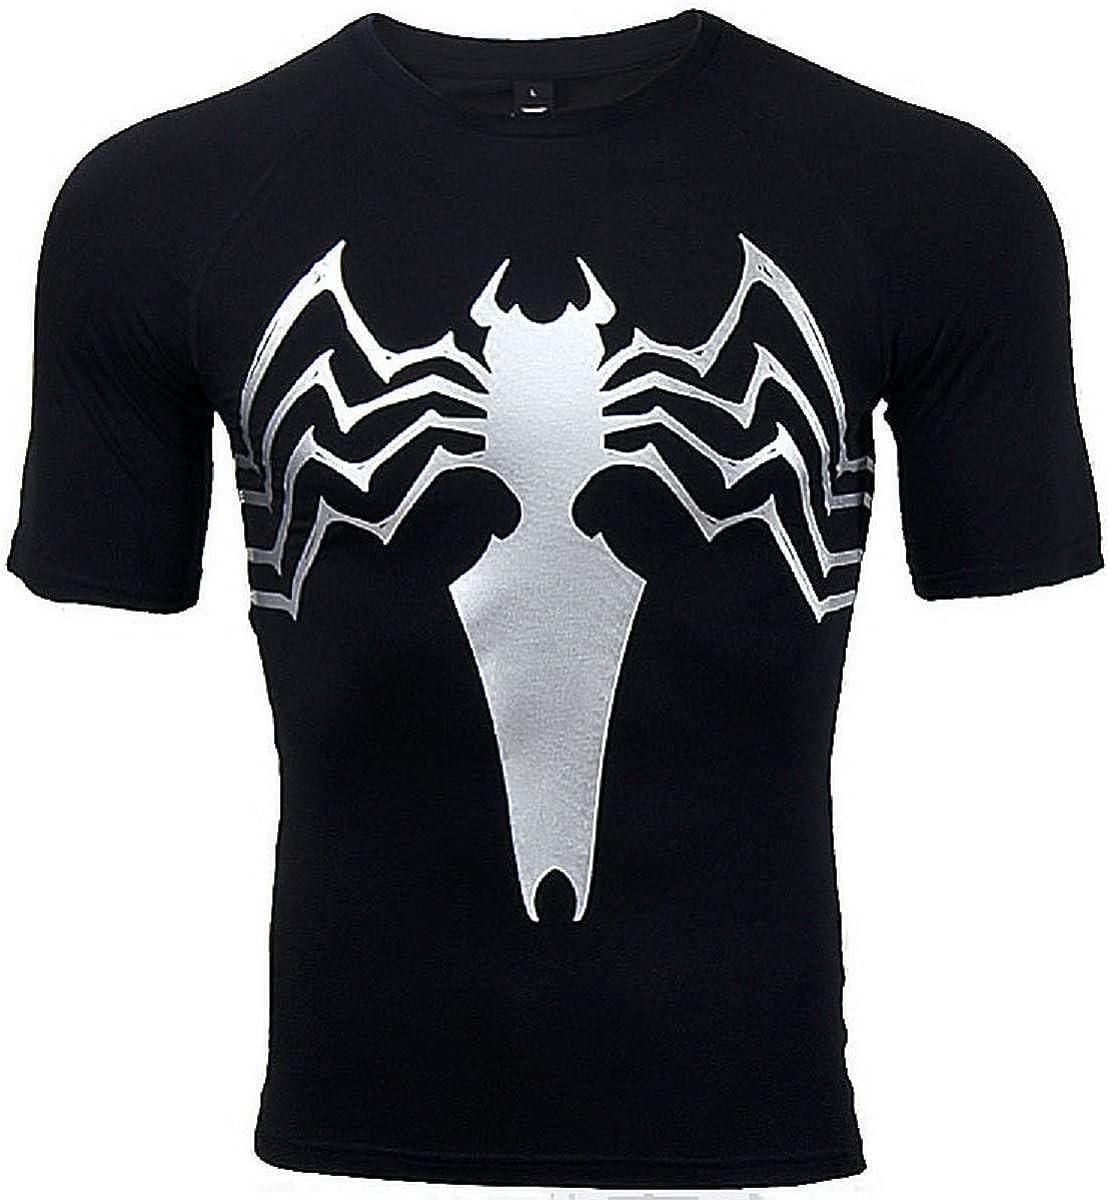 Raglan Short Sleeve 3D Printed T-Shirts Venom Men Compression Shirt Fitness for Male for Tops